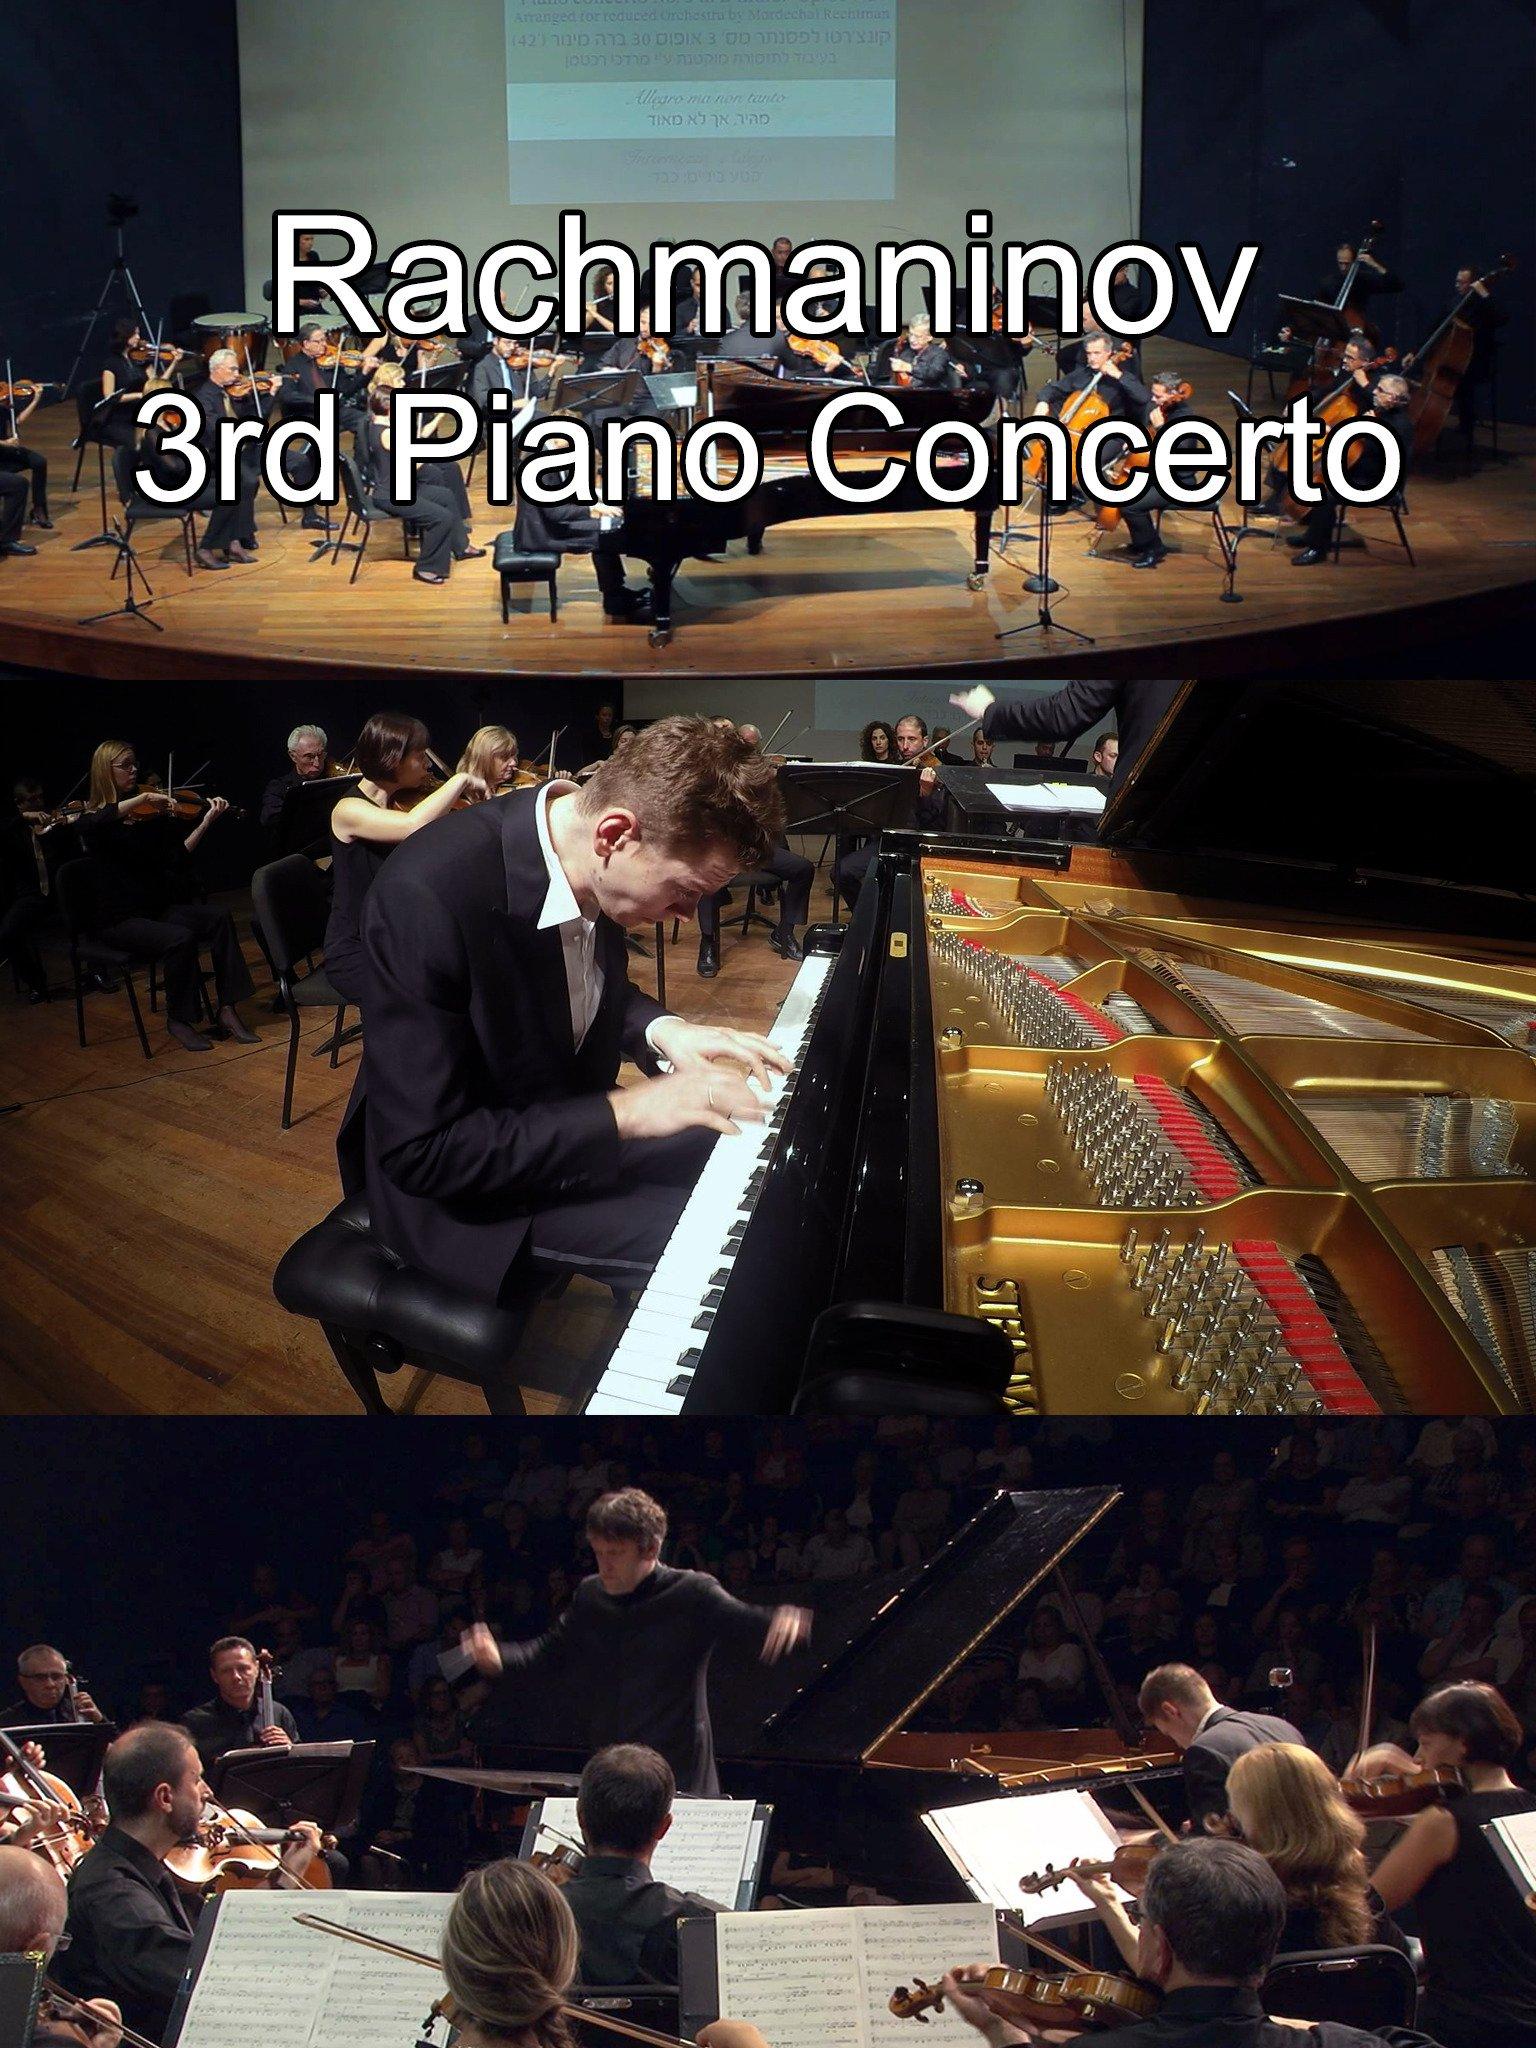 Rachmaninov 3rd Piano Concerto